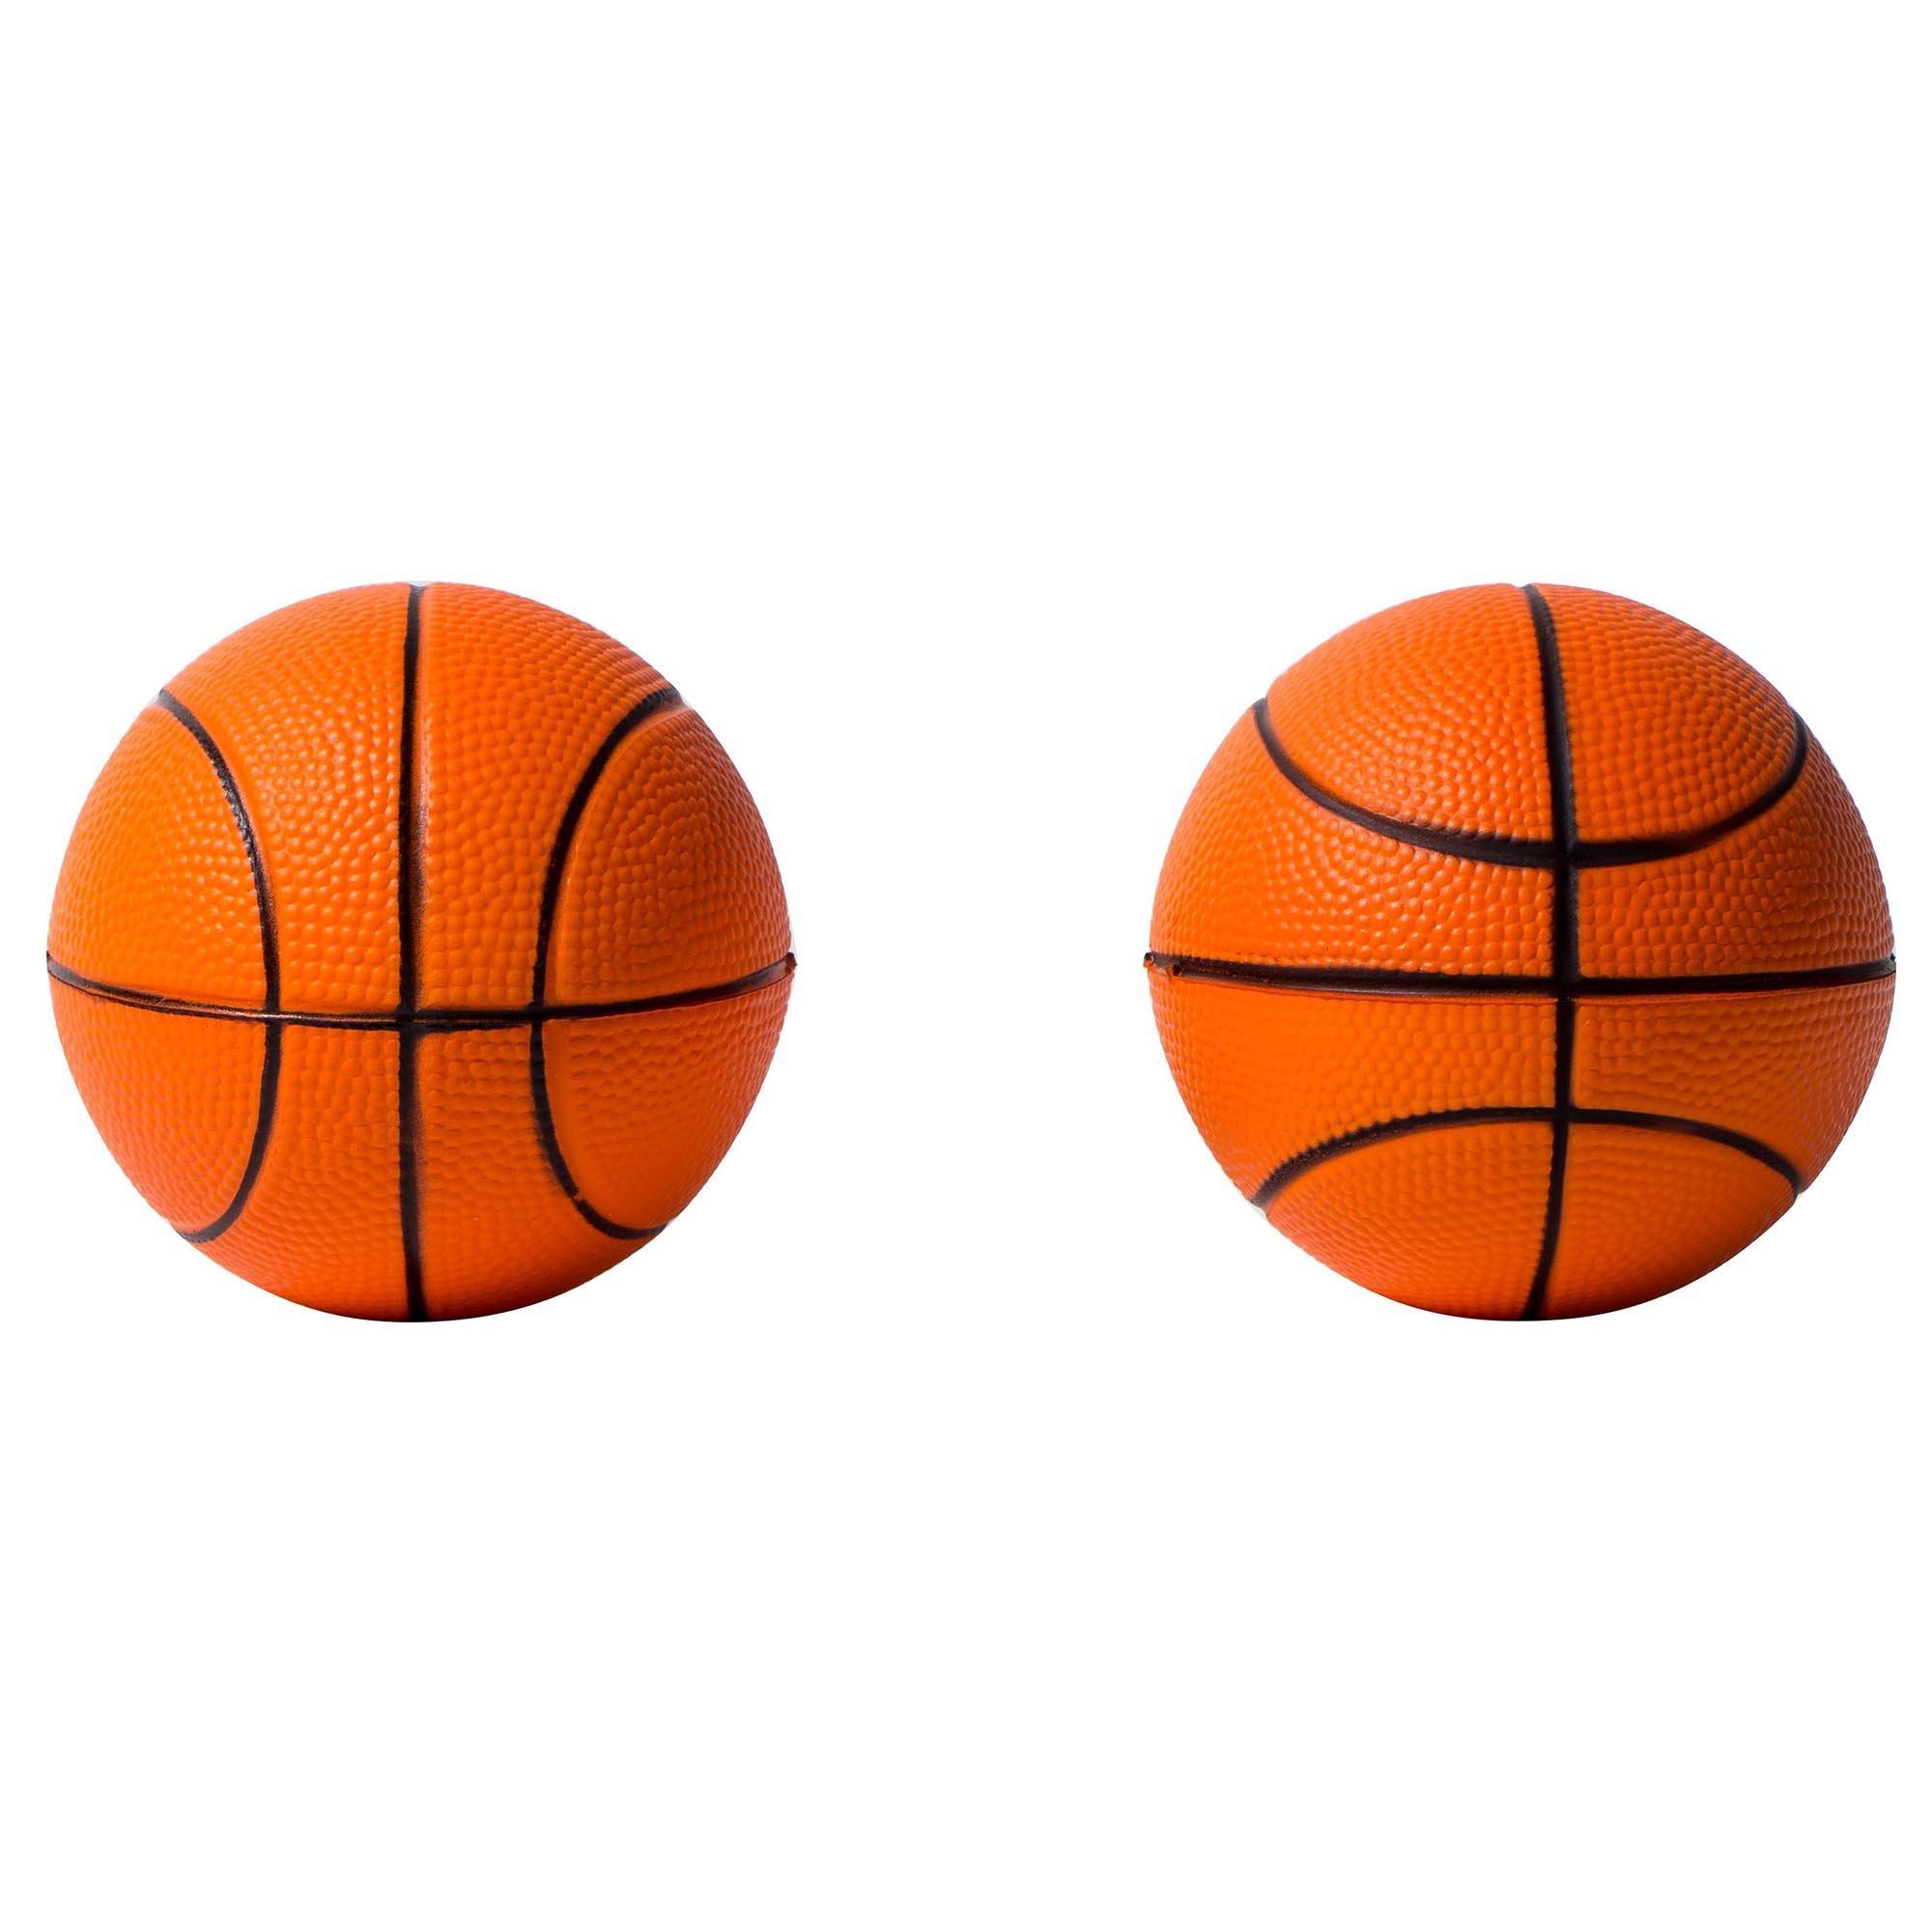 Franklin Sports Shoot Again Basketballs